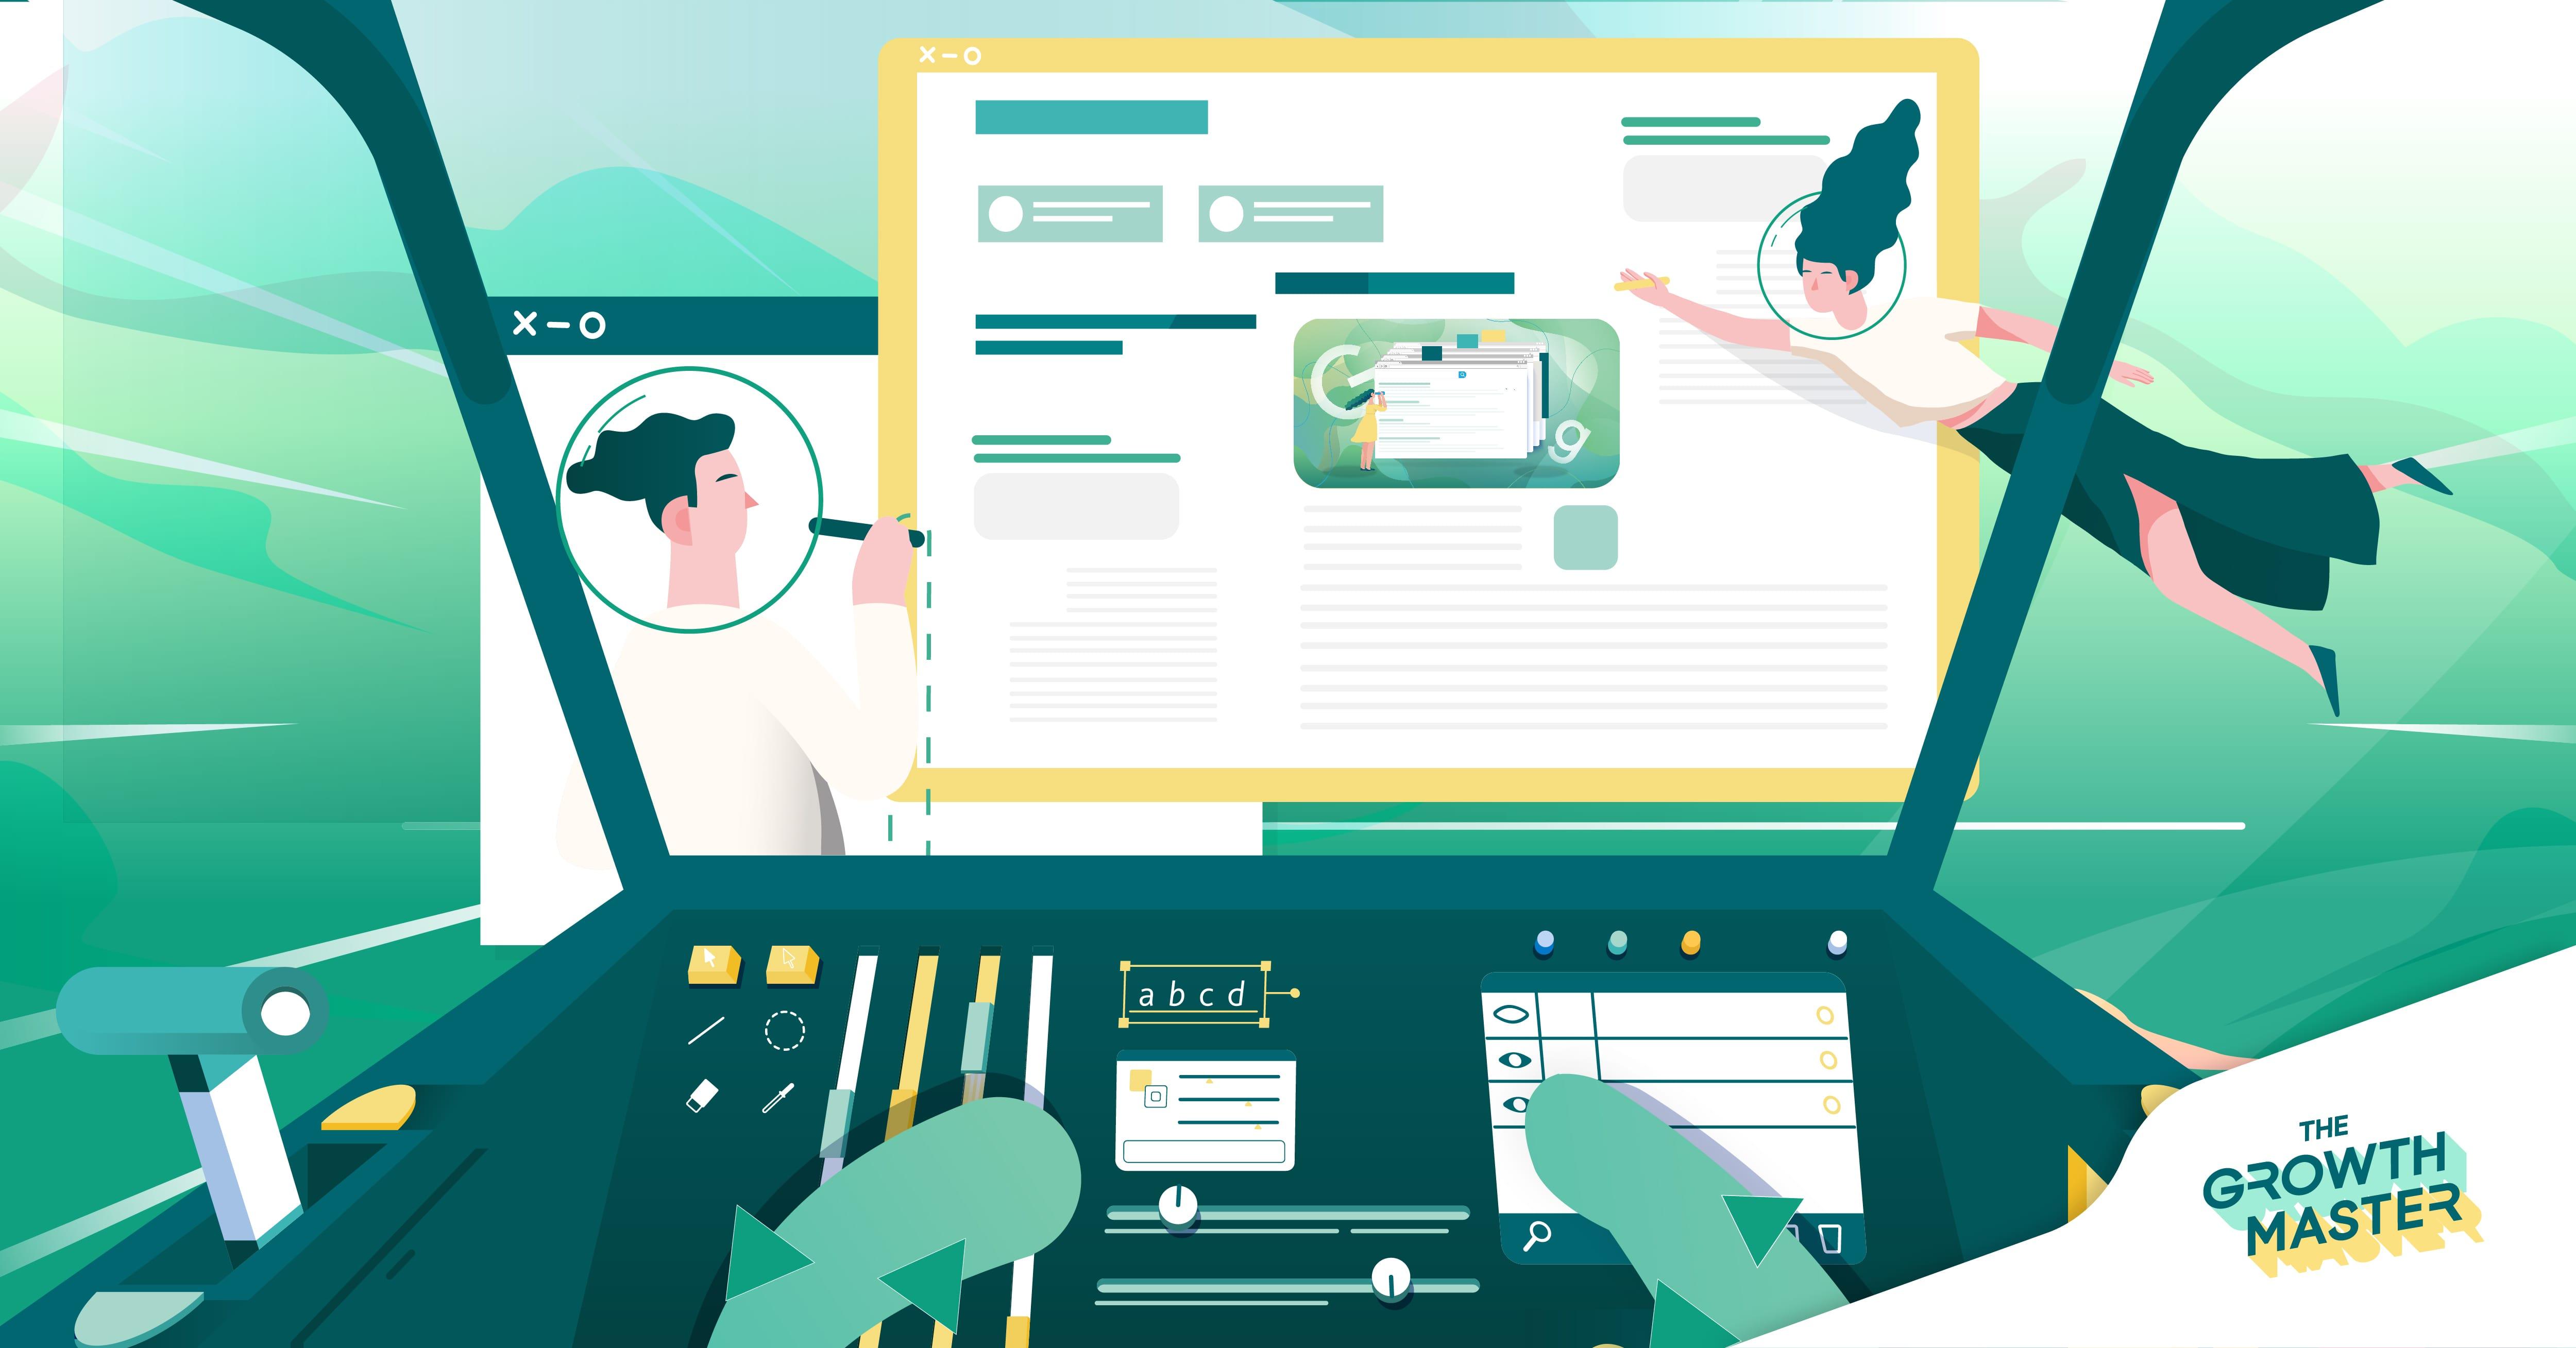 Original Content คืออะไร ? แชร์เทคนิคเริ่มสร้างบทความแบบ Original Content อย่างมีคุณภาพ